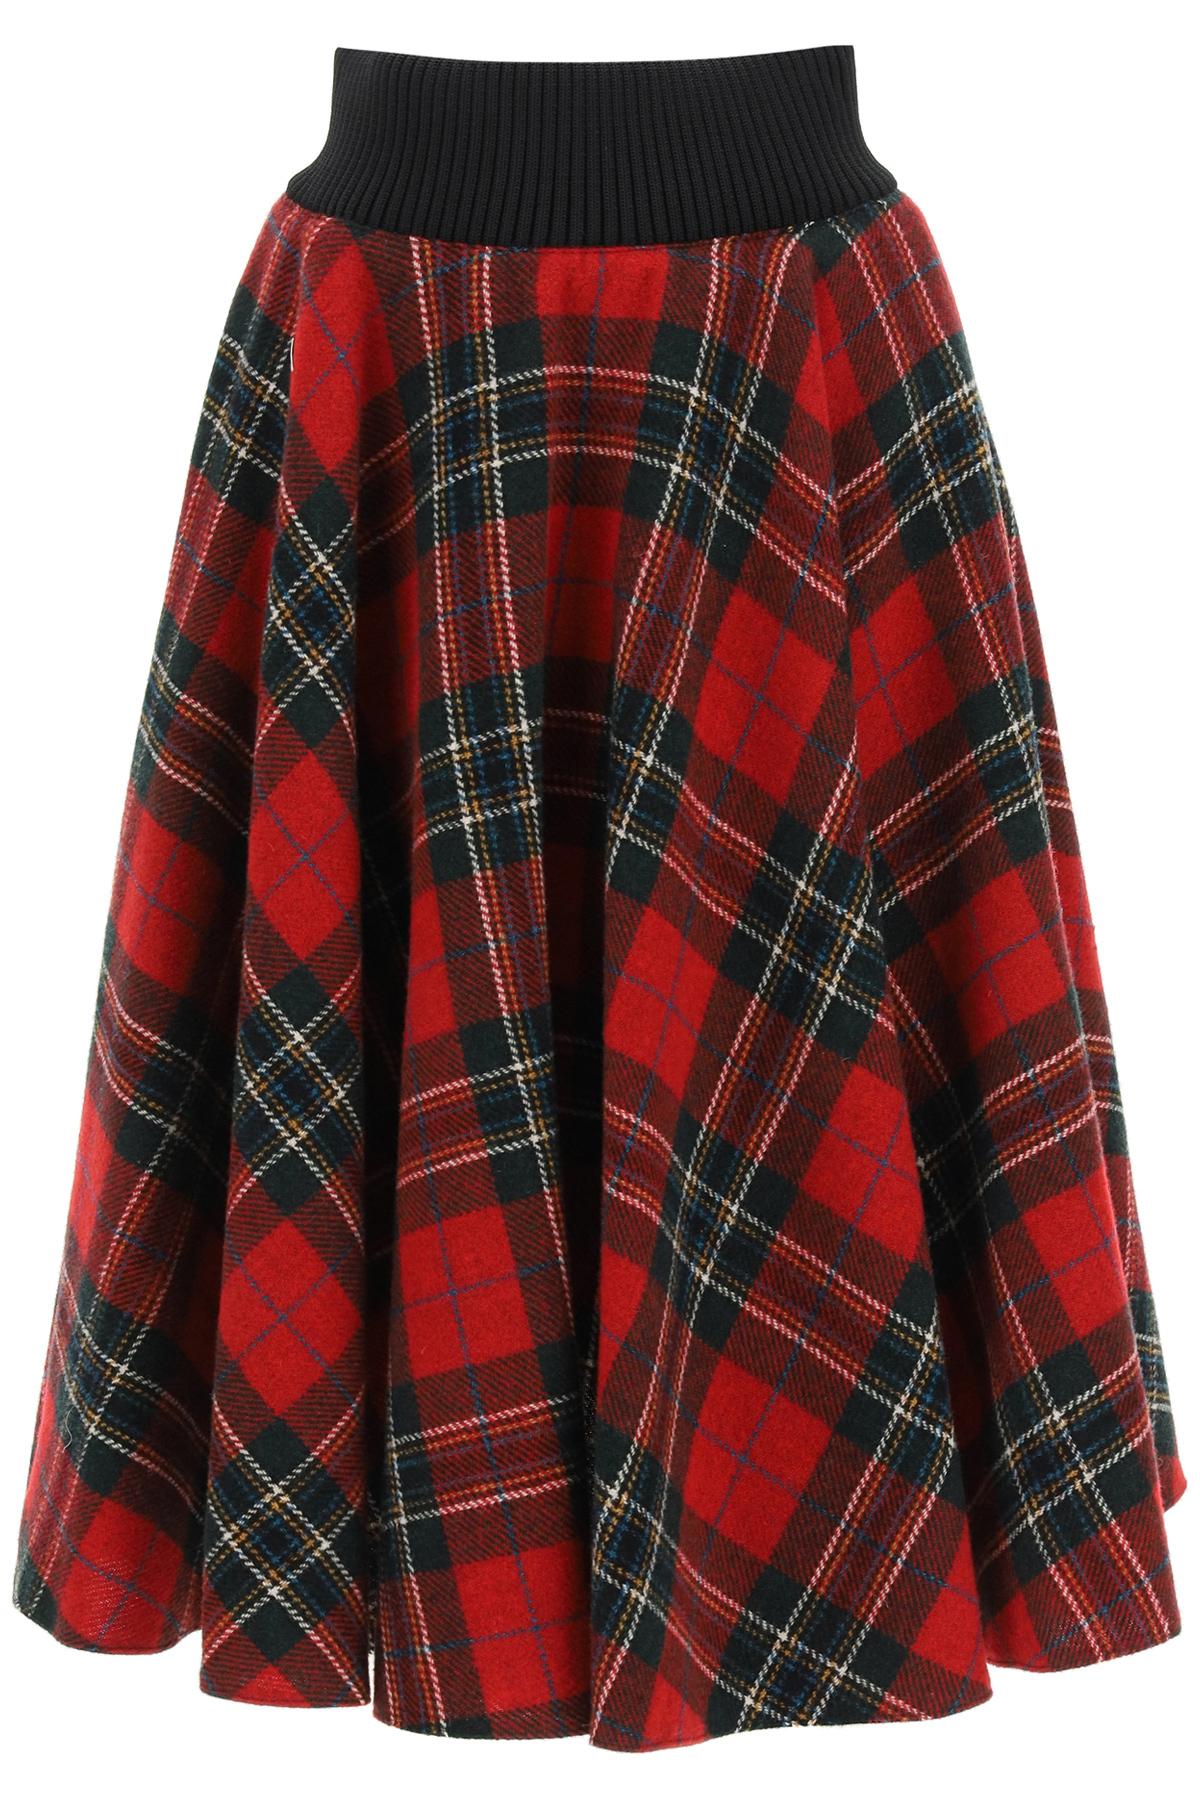 Red valentino gonna midi in lana tartan